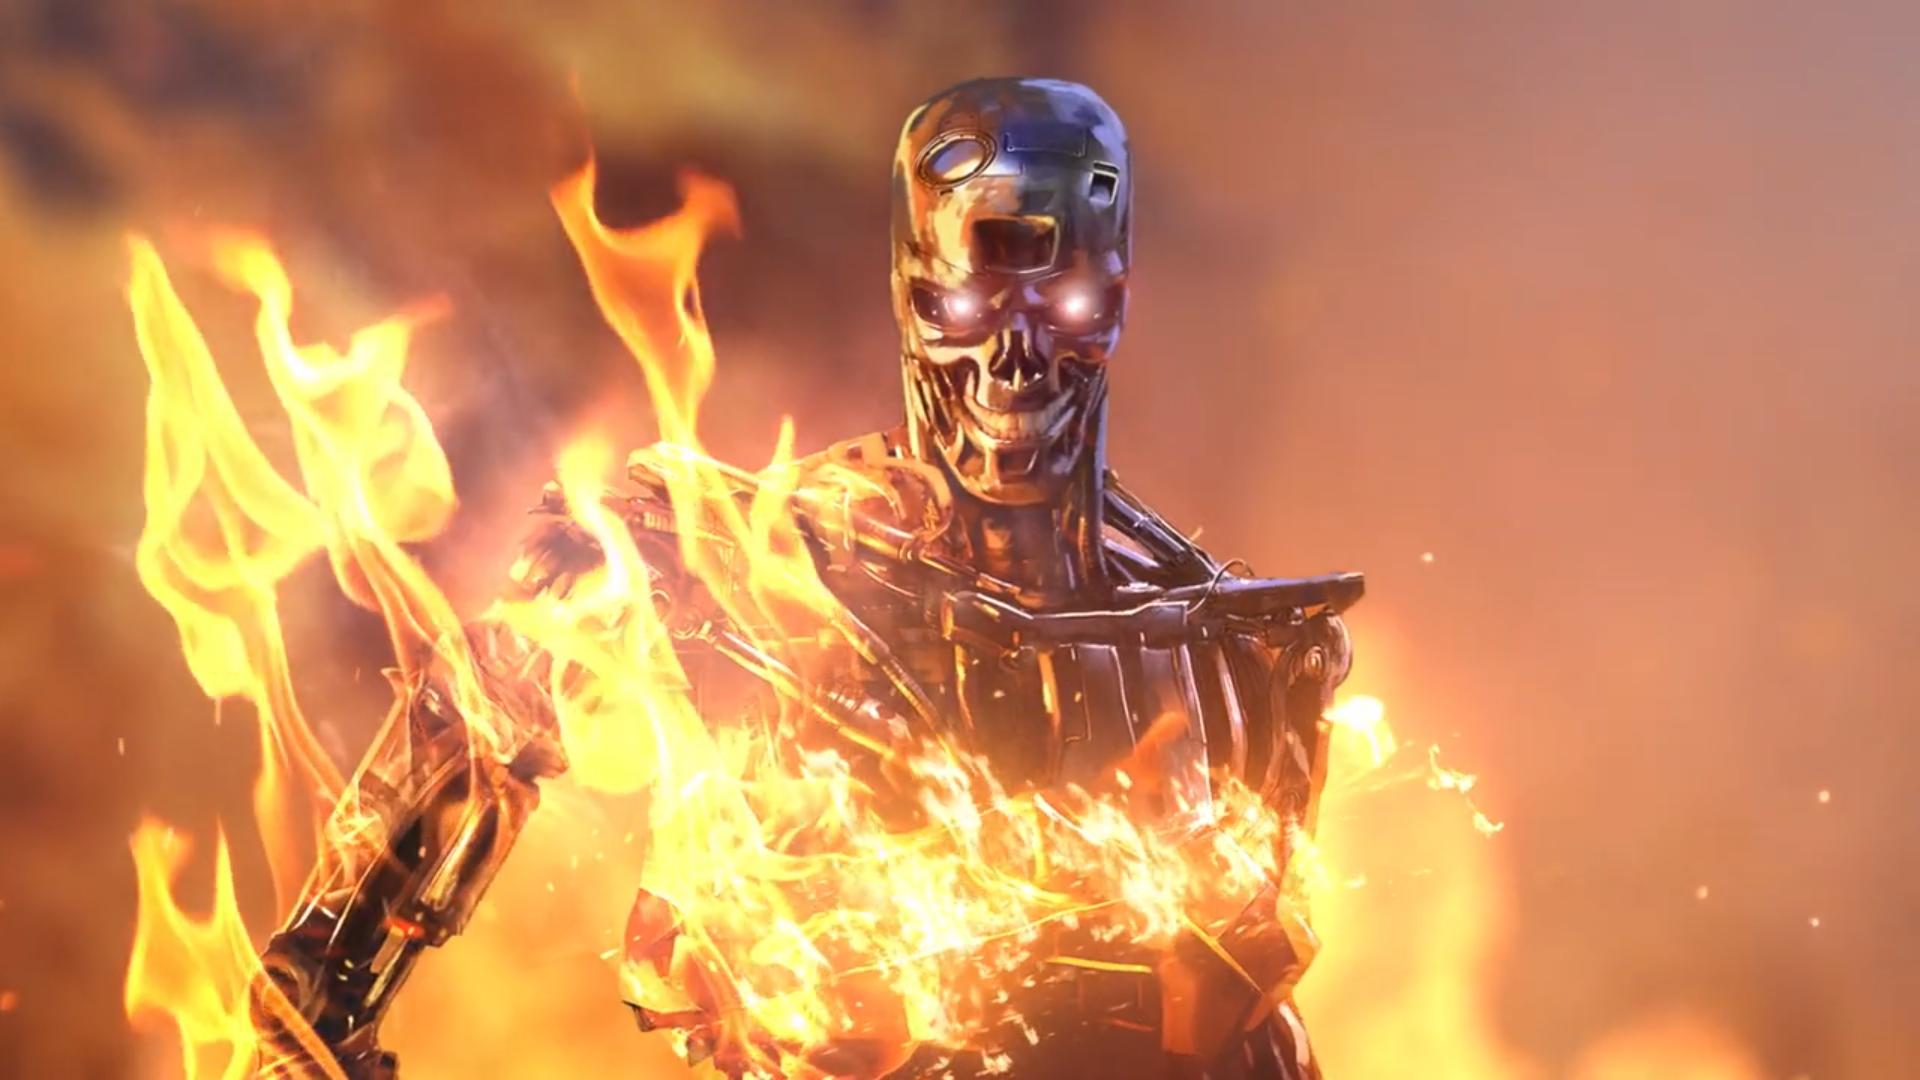 terminator rpg robot fire.png